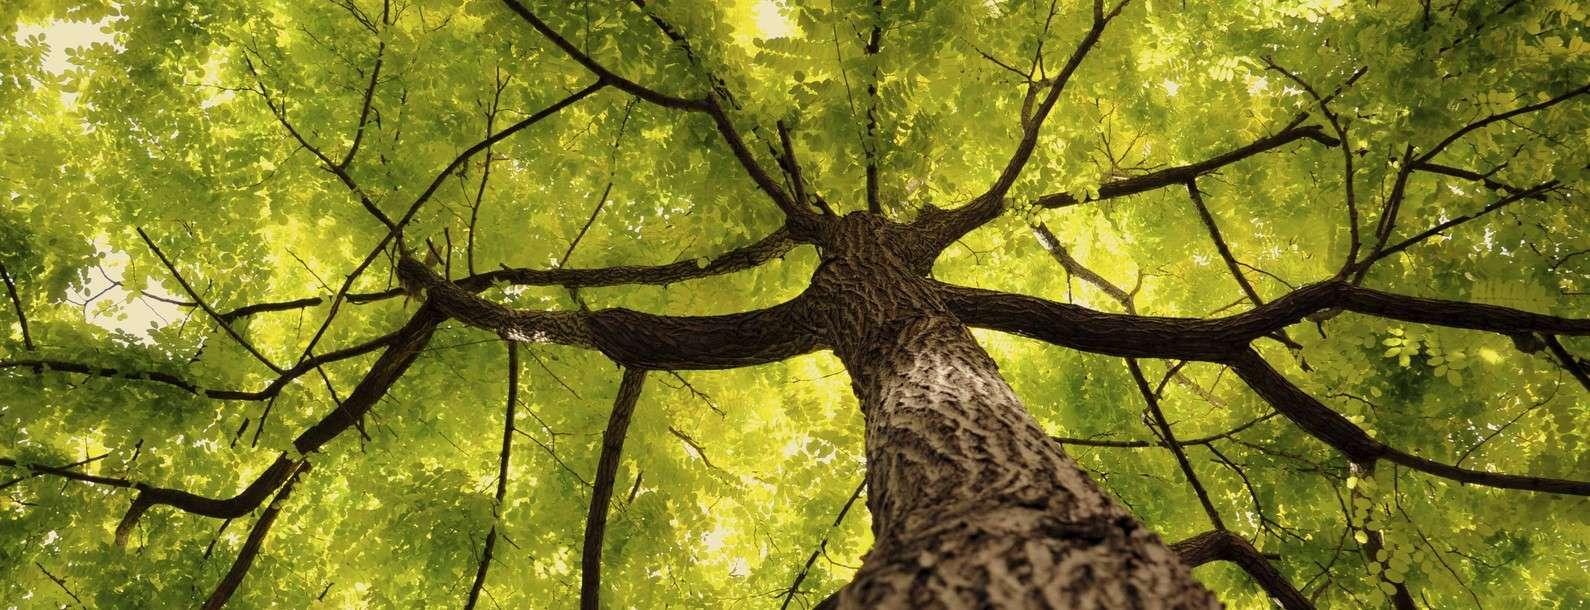 jade-produits-biocontrole